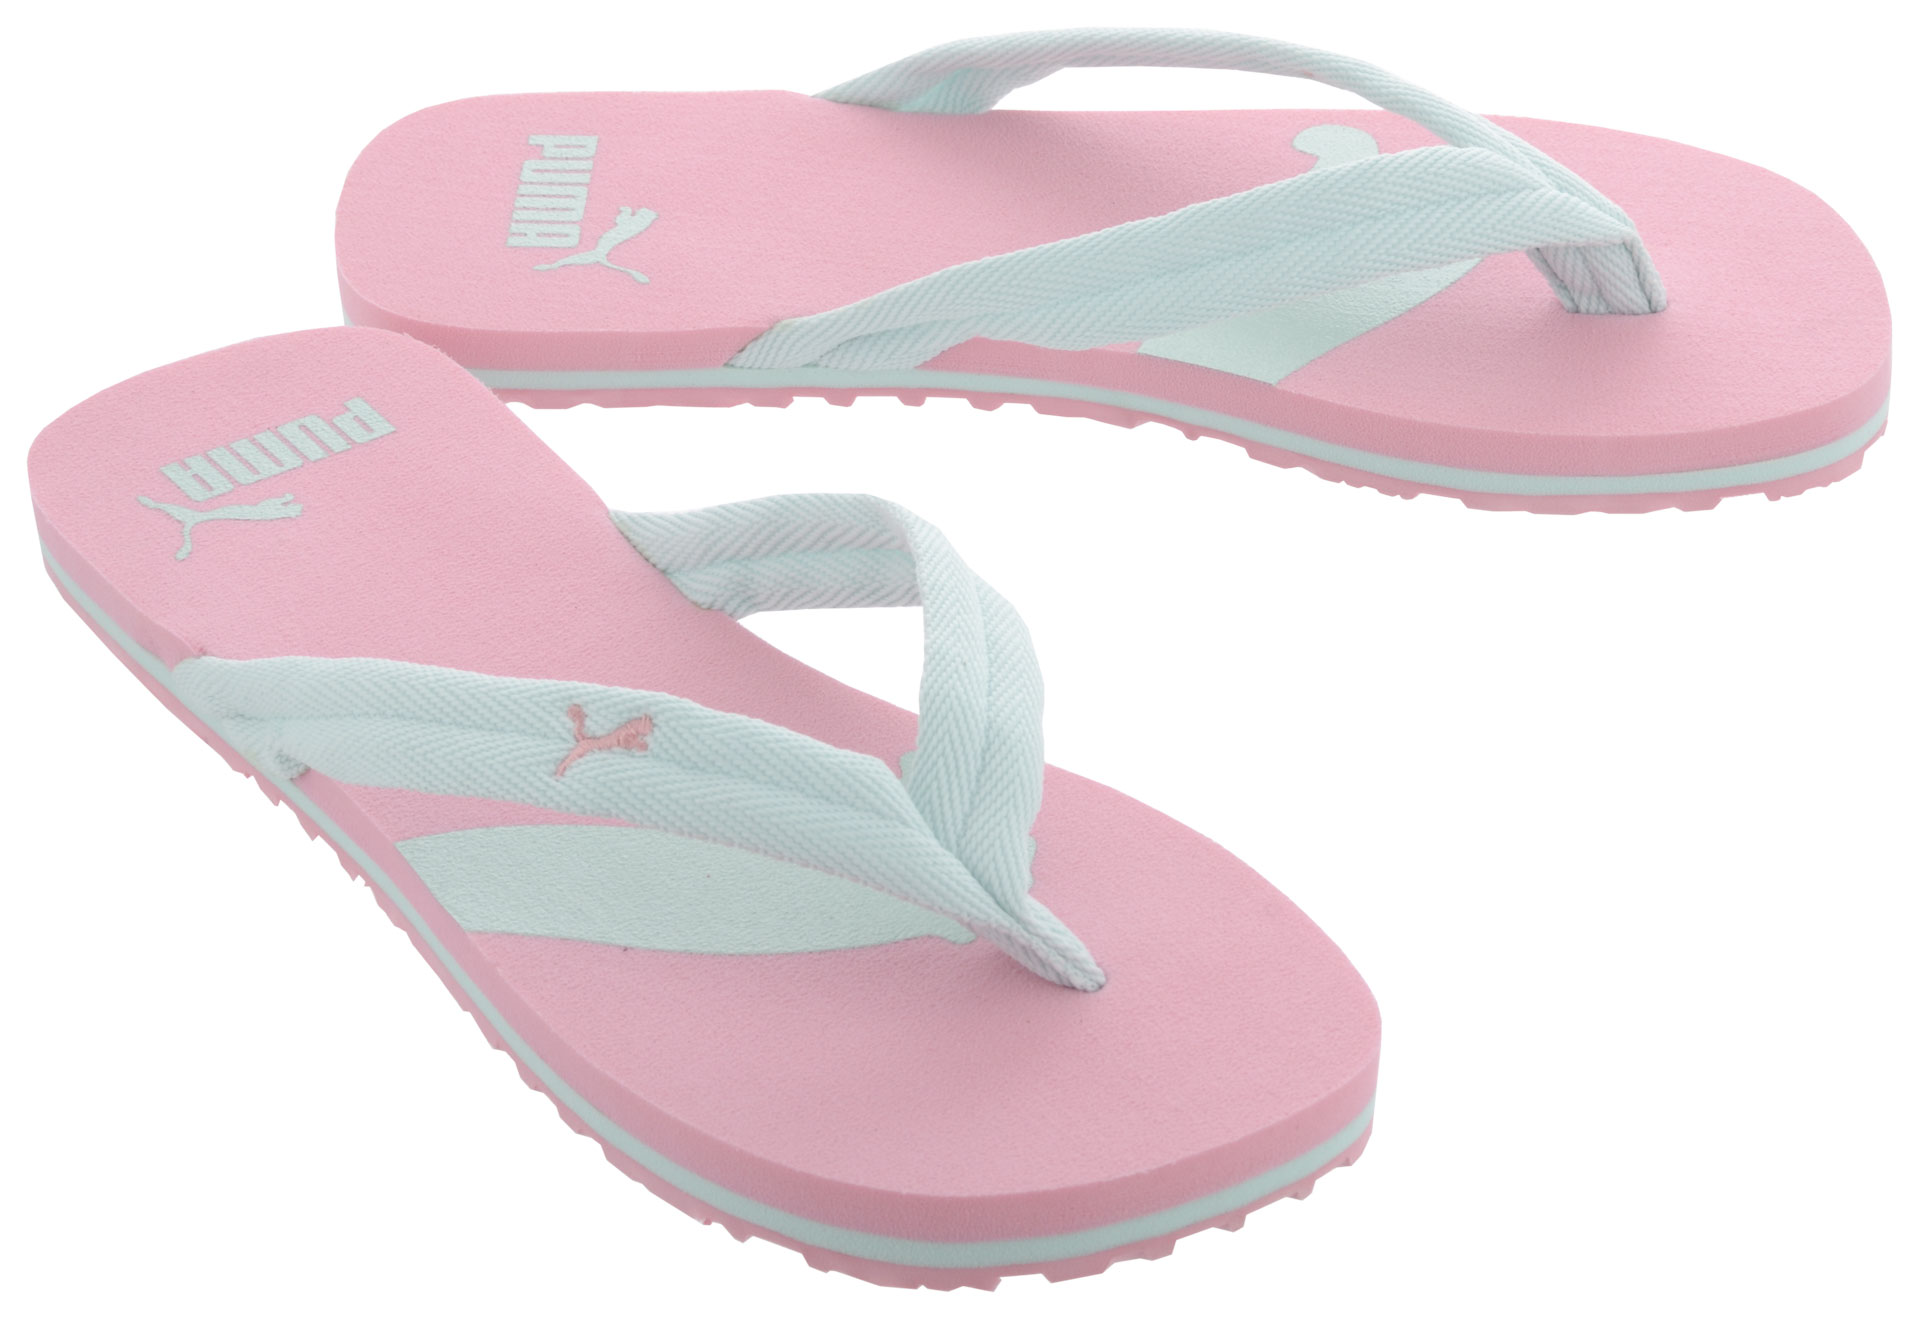 puma flip flops damen rosa